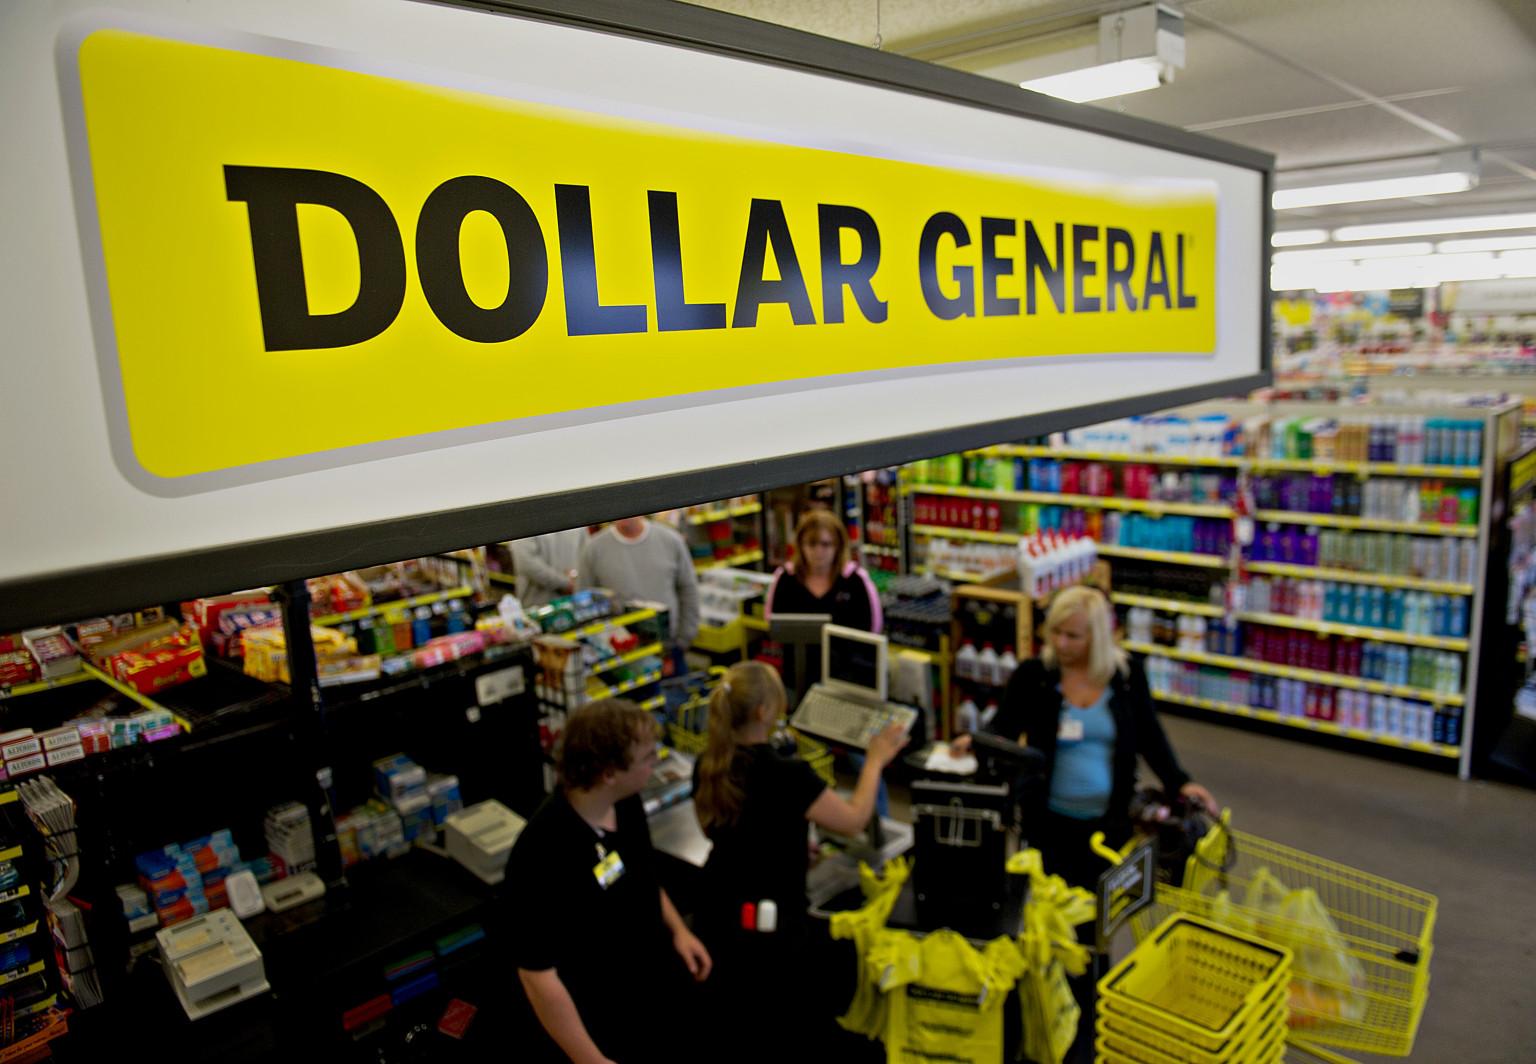 Dollar General - Pahokee Information